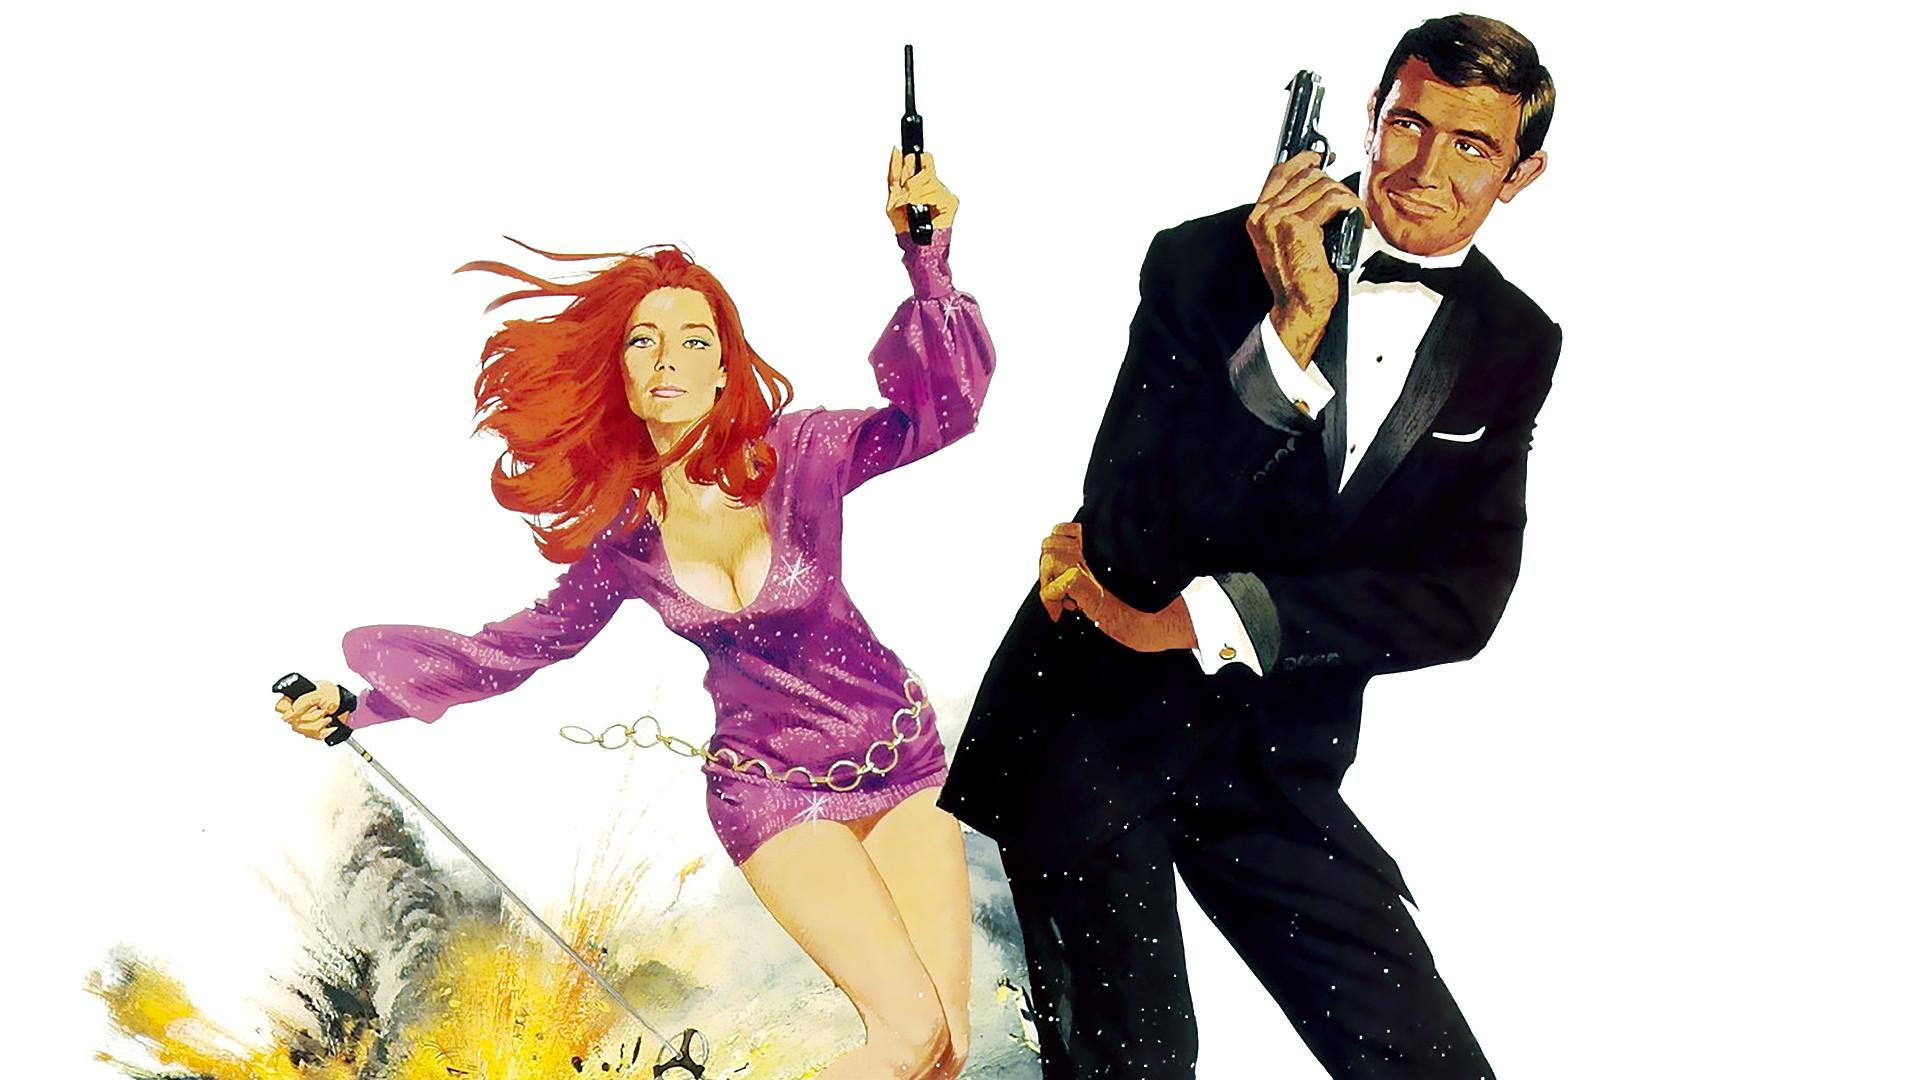 Res: 1920x1080, ON HER MAJESTYS SECRET SERVICE 007 james bond wallpaper |  |  102348 | WallpaperUP